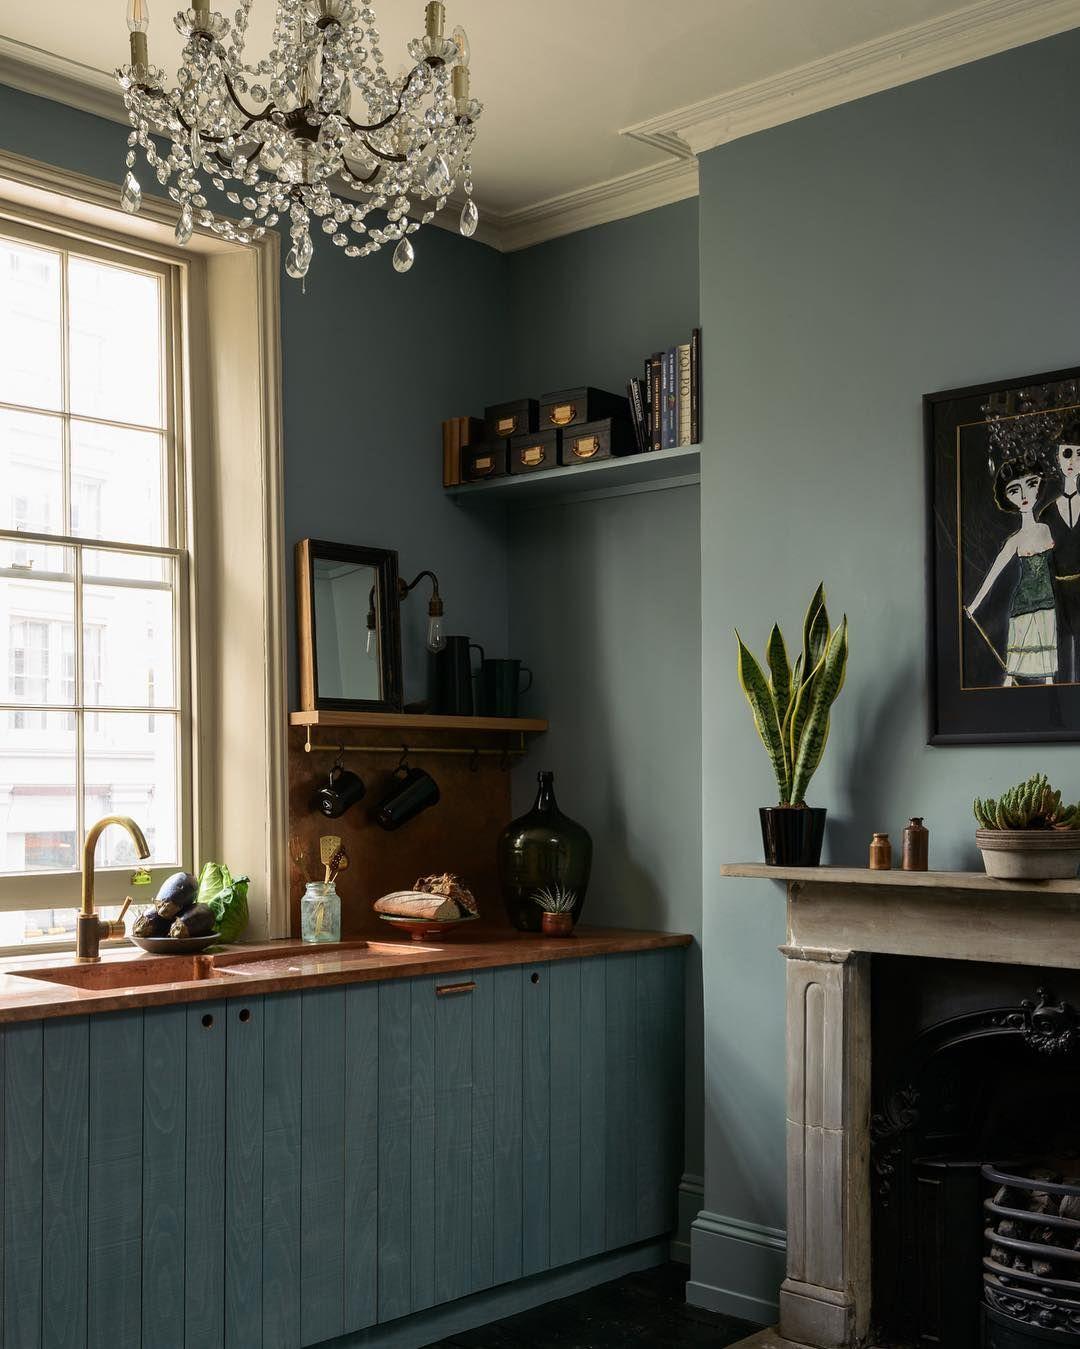 10 amazing english country kitchens by devol kitchen design trends home decor kitchen on kitchen decor trends id=93494